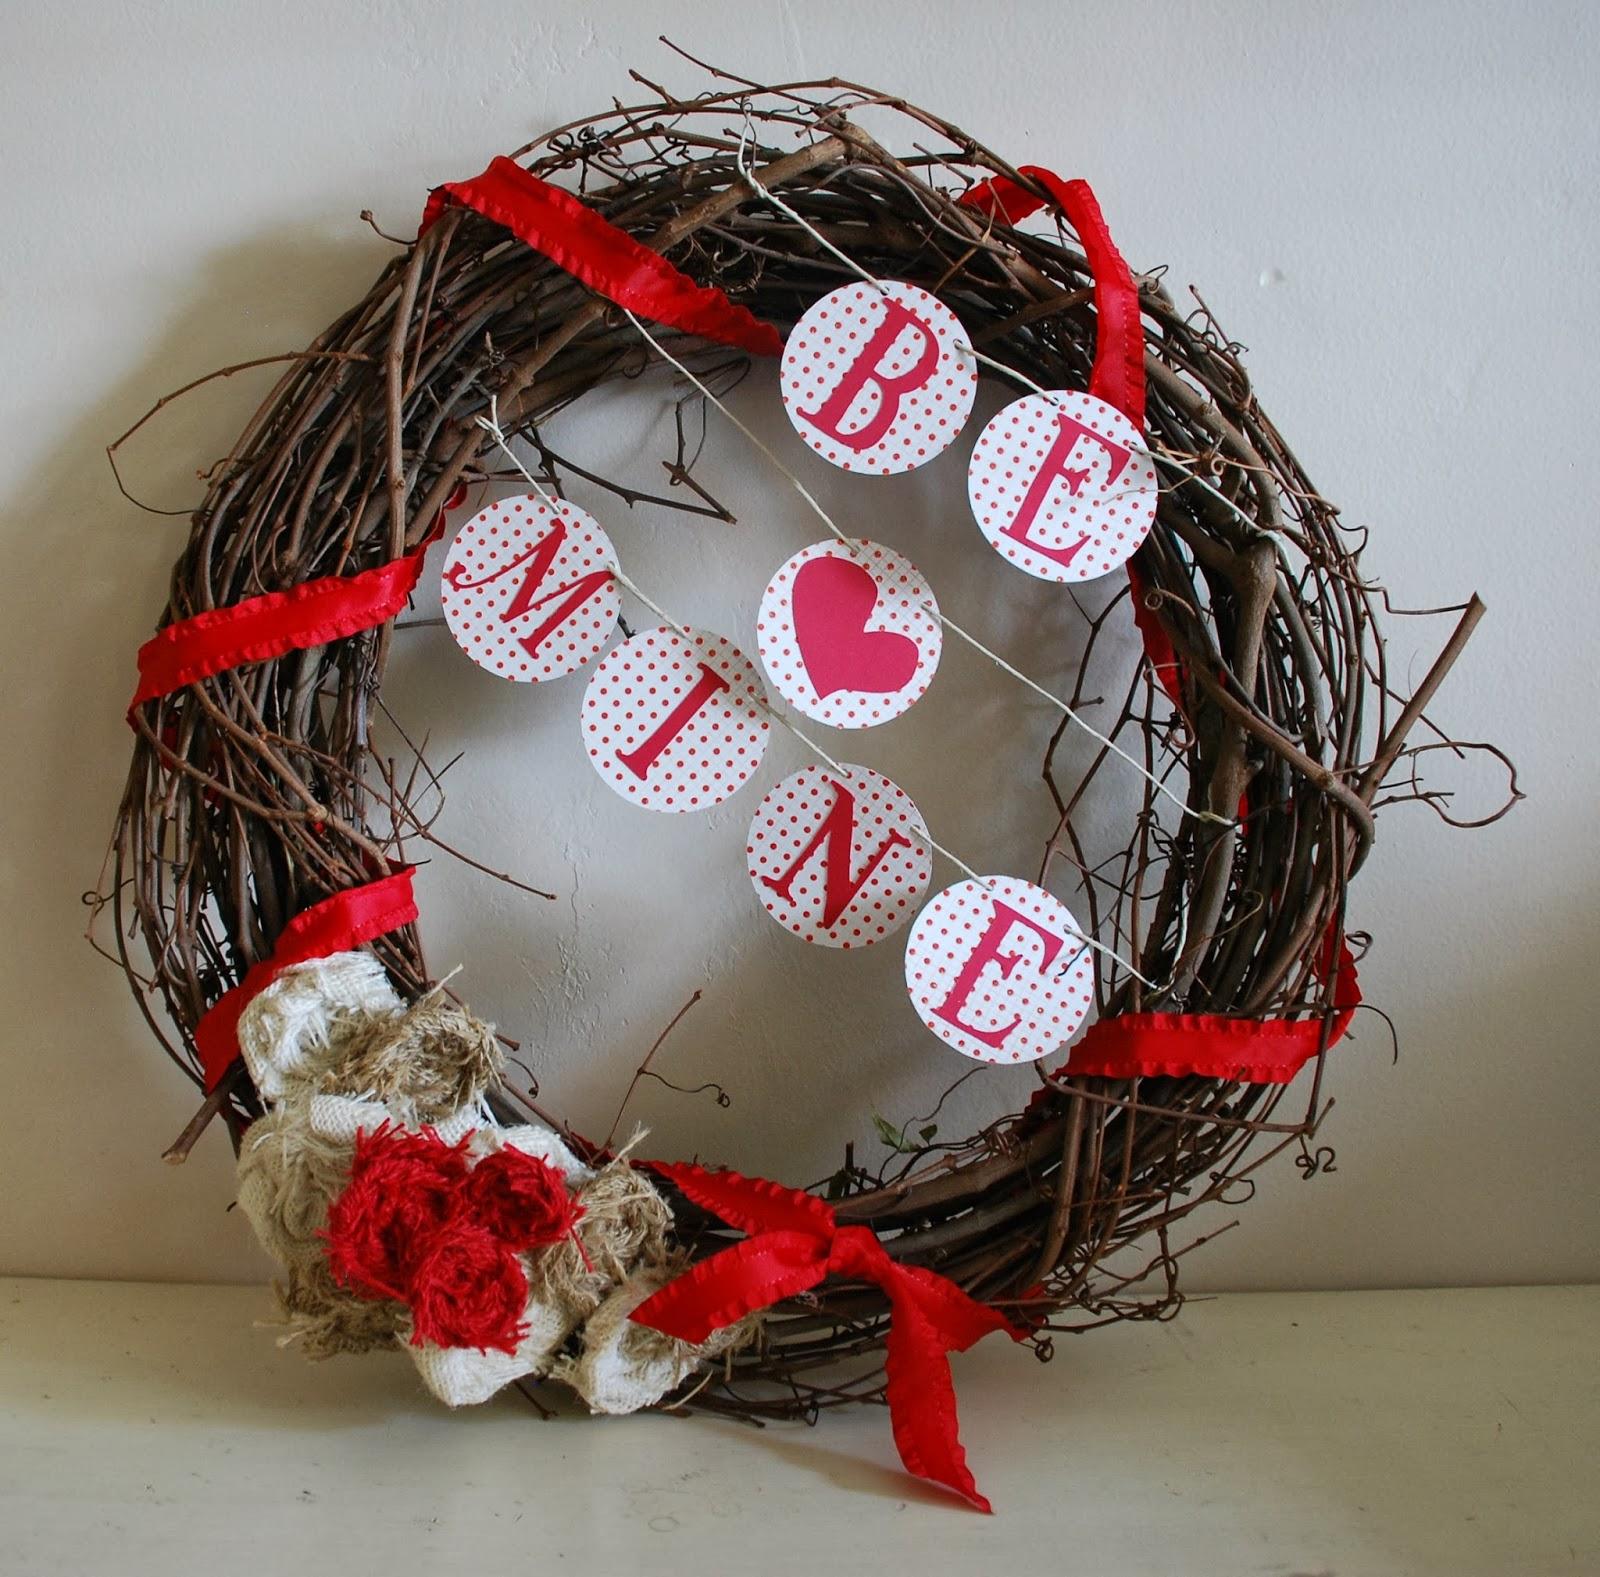 Snippets Of Creations Diy Valentine S Day Door Wreath